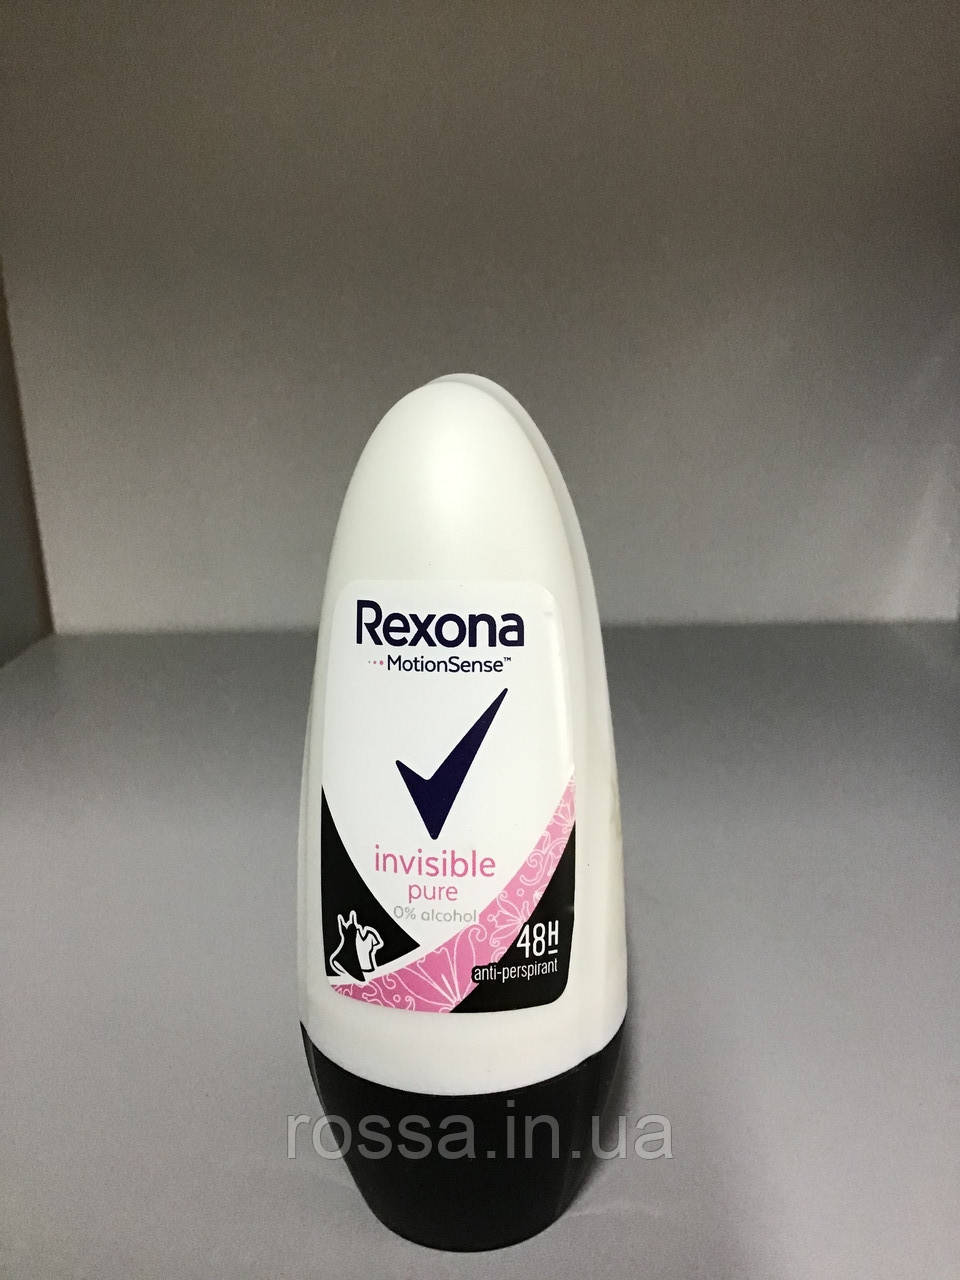 Дезодорант женский Rexona шариковый Motionsense invisible pure 50 мл